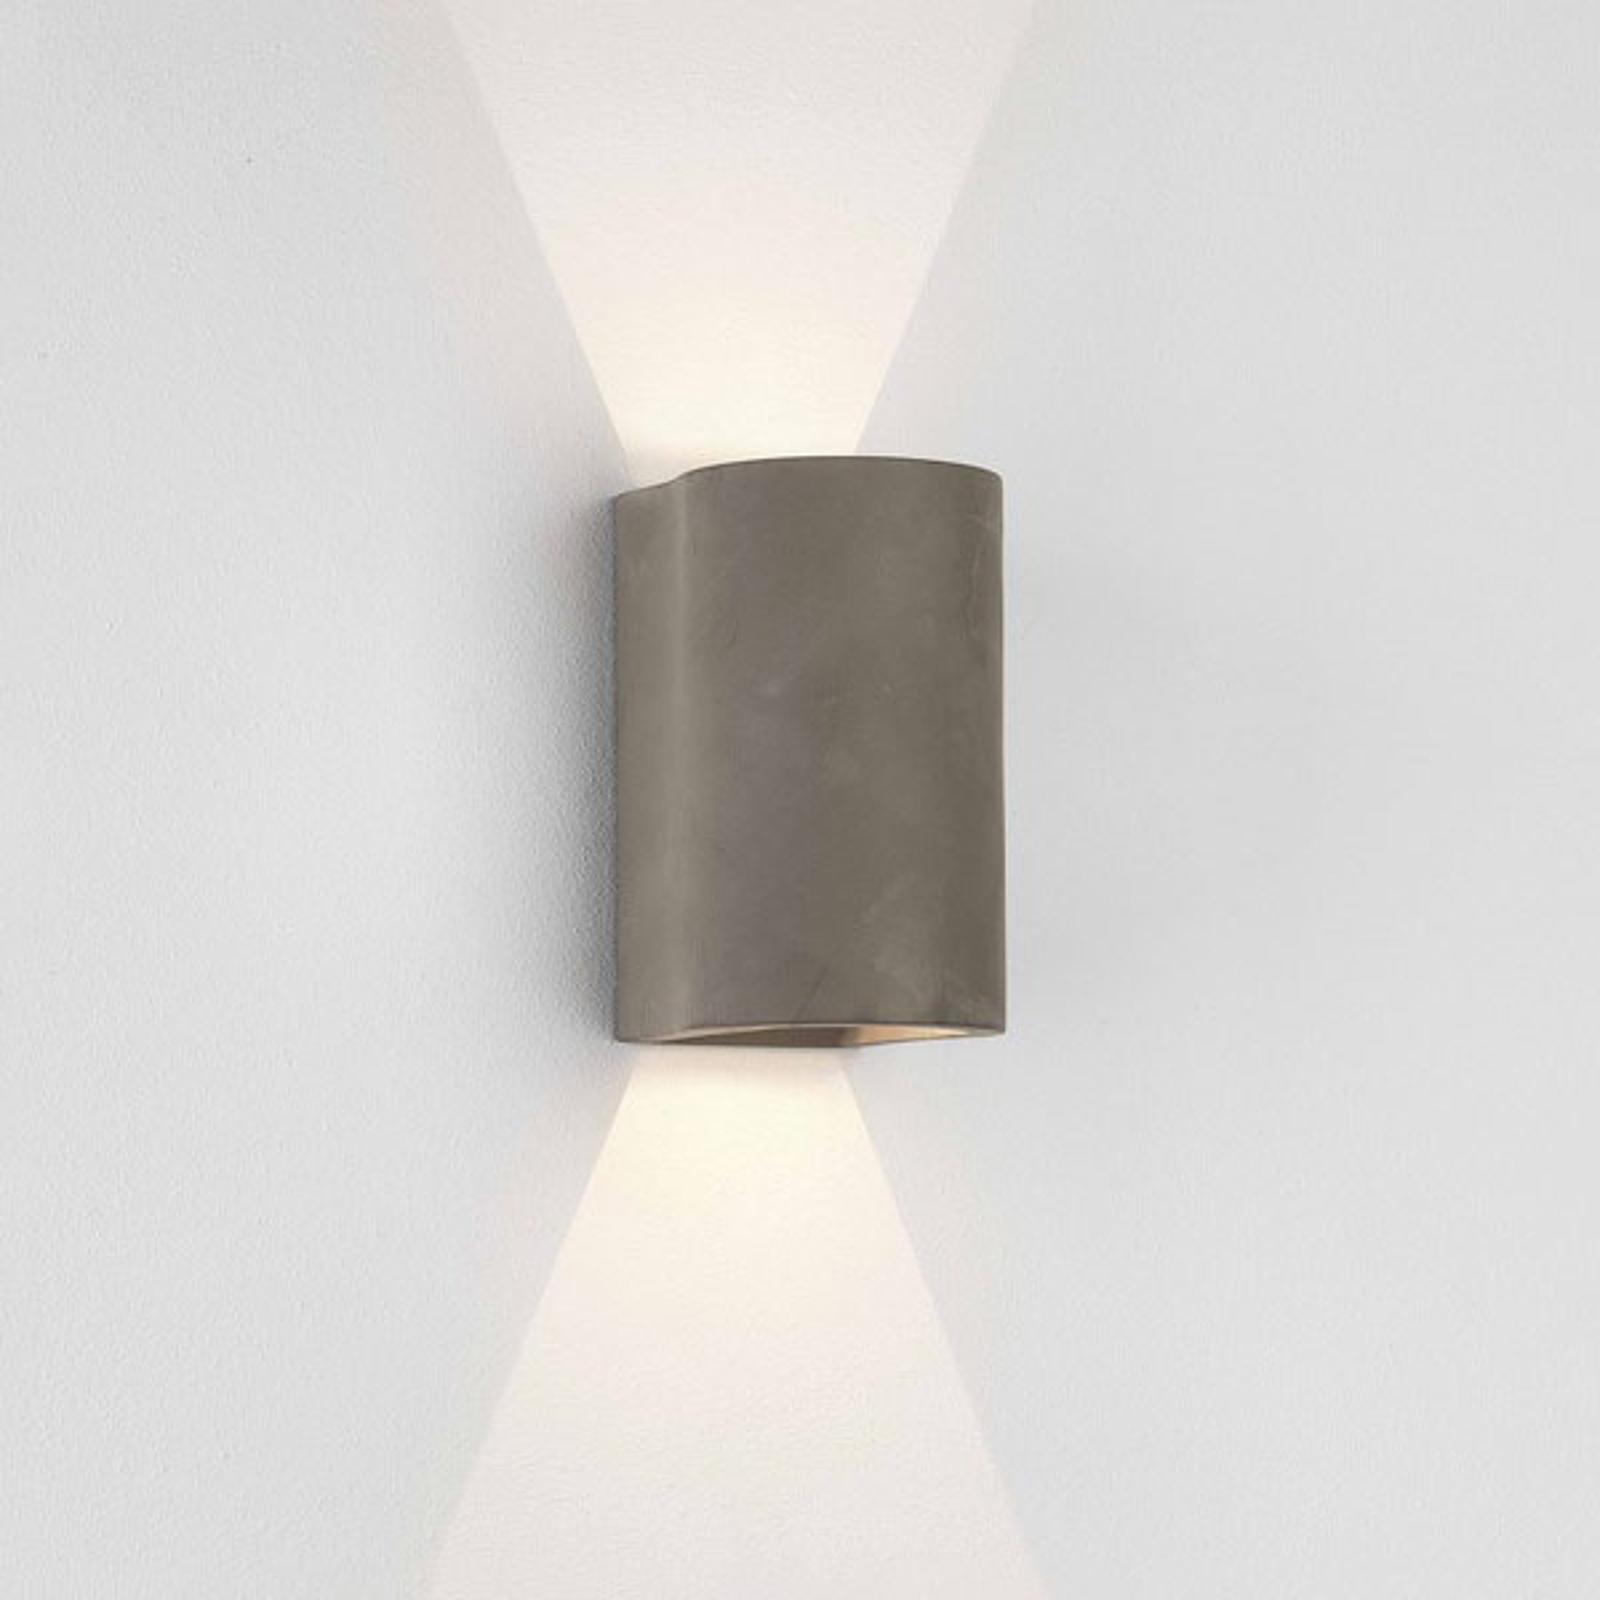 Astro Dunbar LED buitenwandlamp, 2-lamps